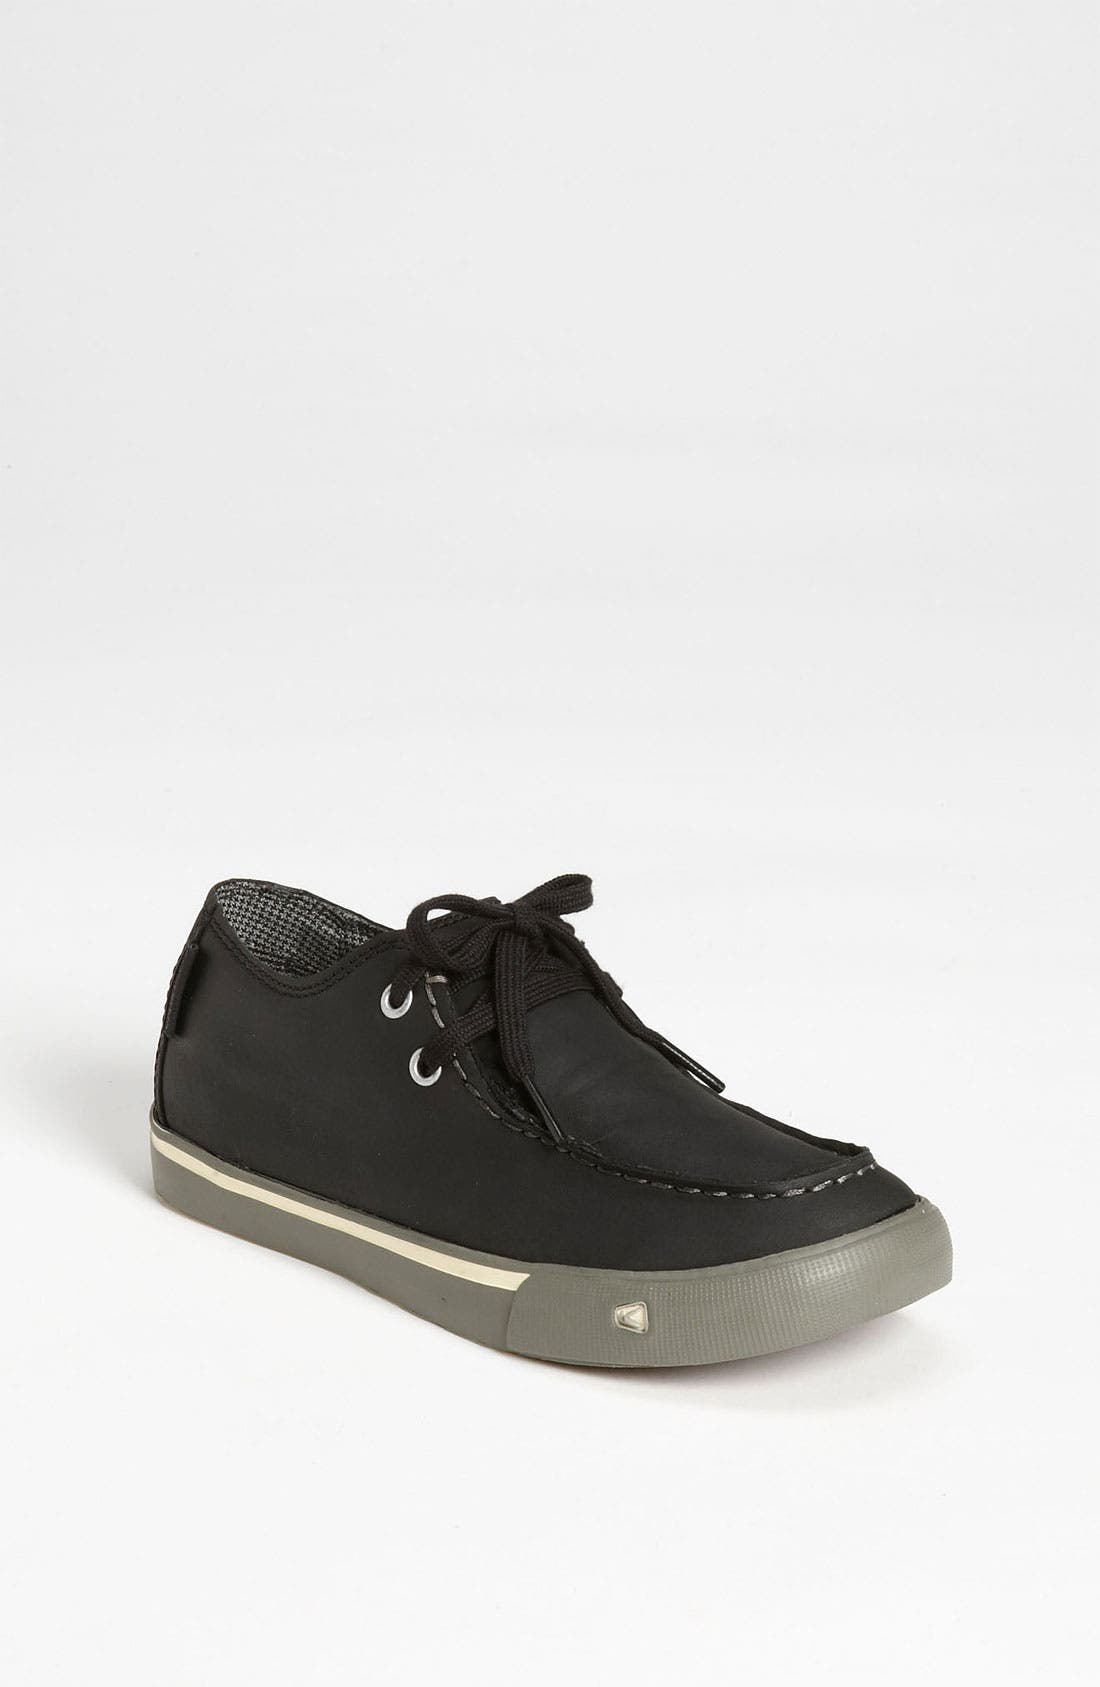 Main Image - Keen 'Timmons' Sneaker (Baby, Walker, Toddler, Little Kid & Big Kid)